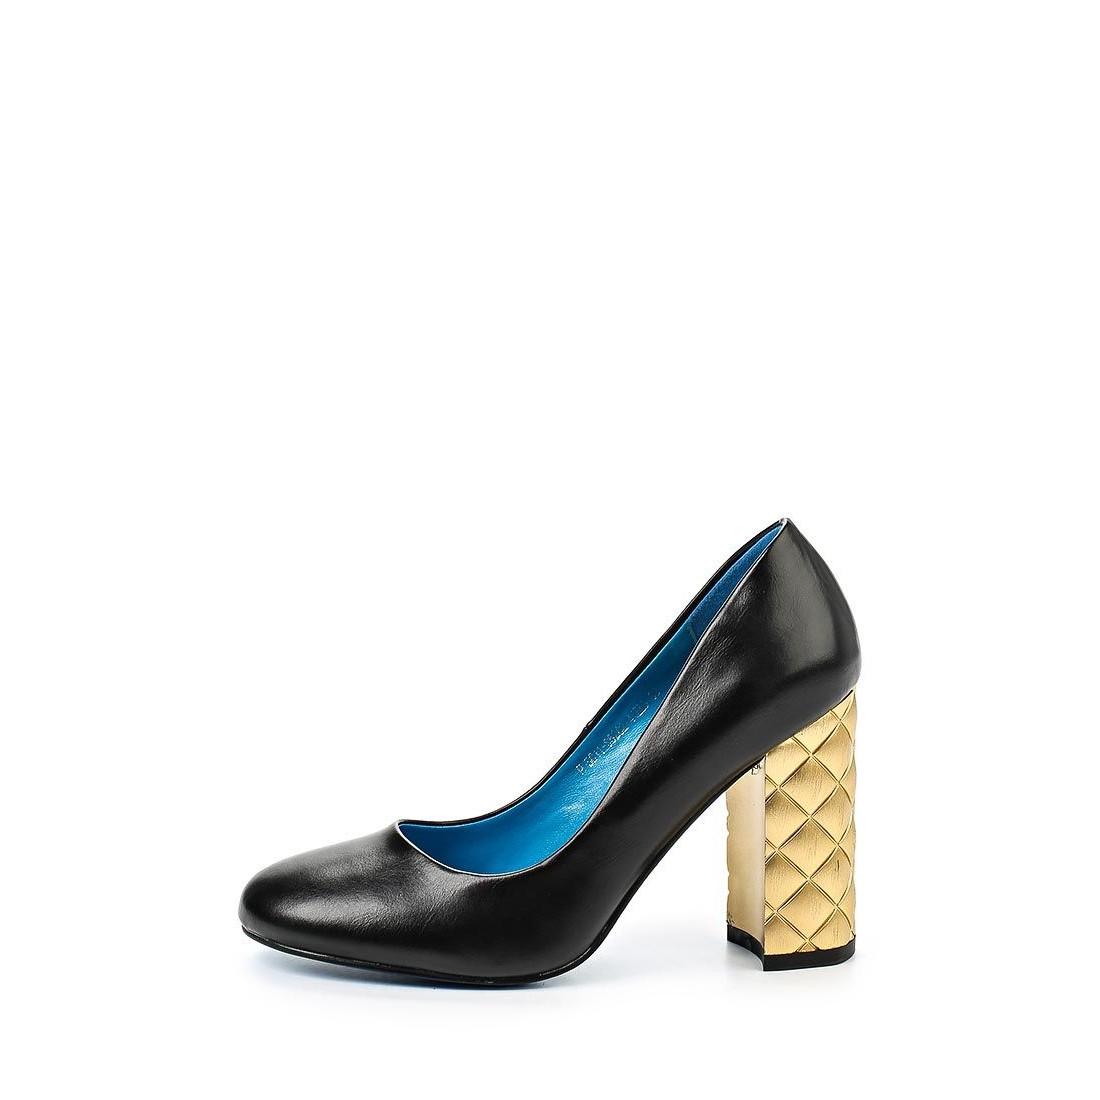 Скидки на обувь рикер